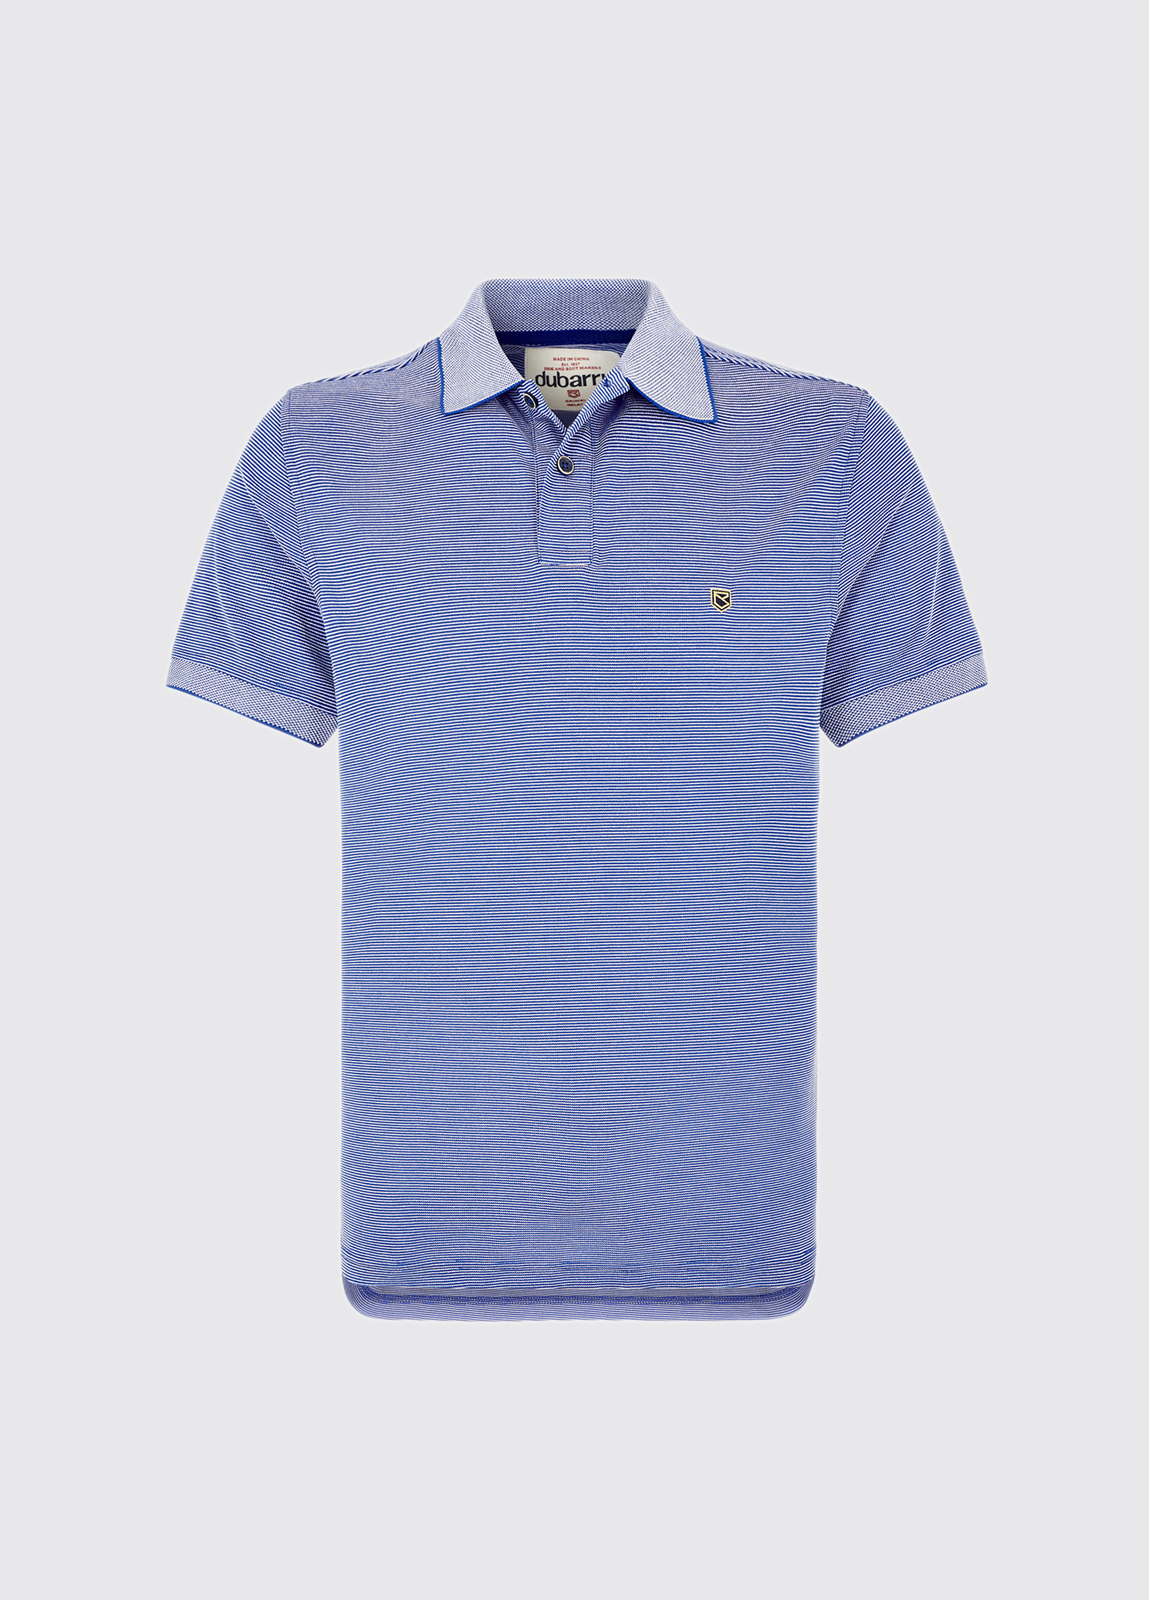 Claremorris Polo Shirt - Royal Blue